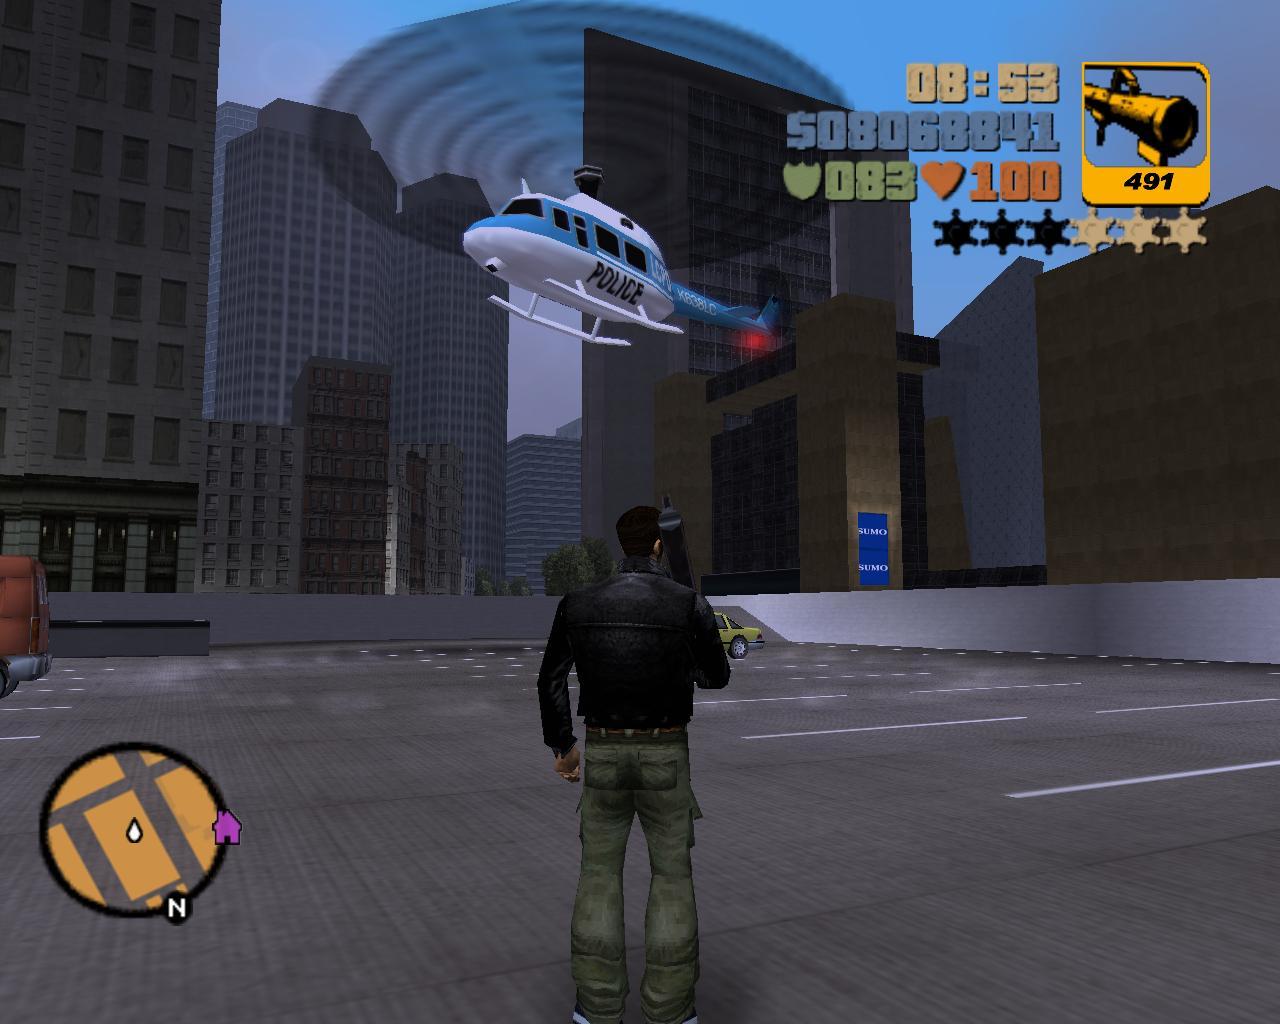 gtavc直升机_《侠盗猎车》系列直升机演变史展示游戏画质